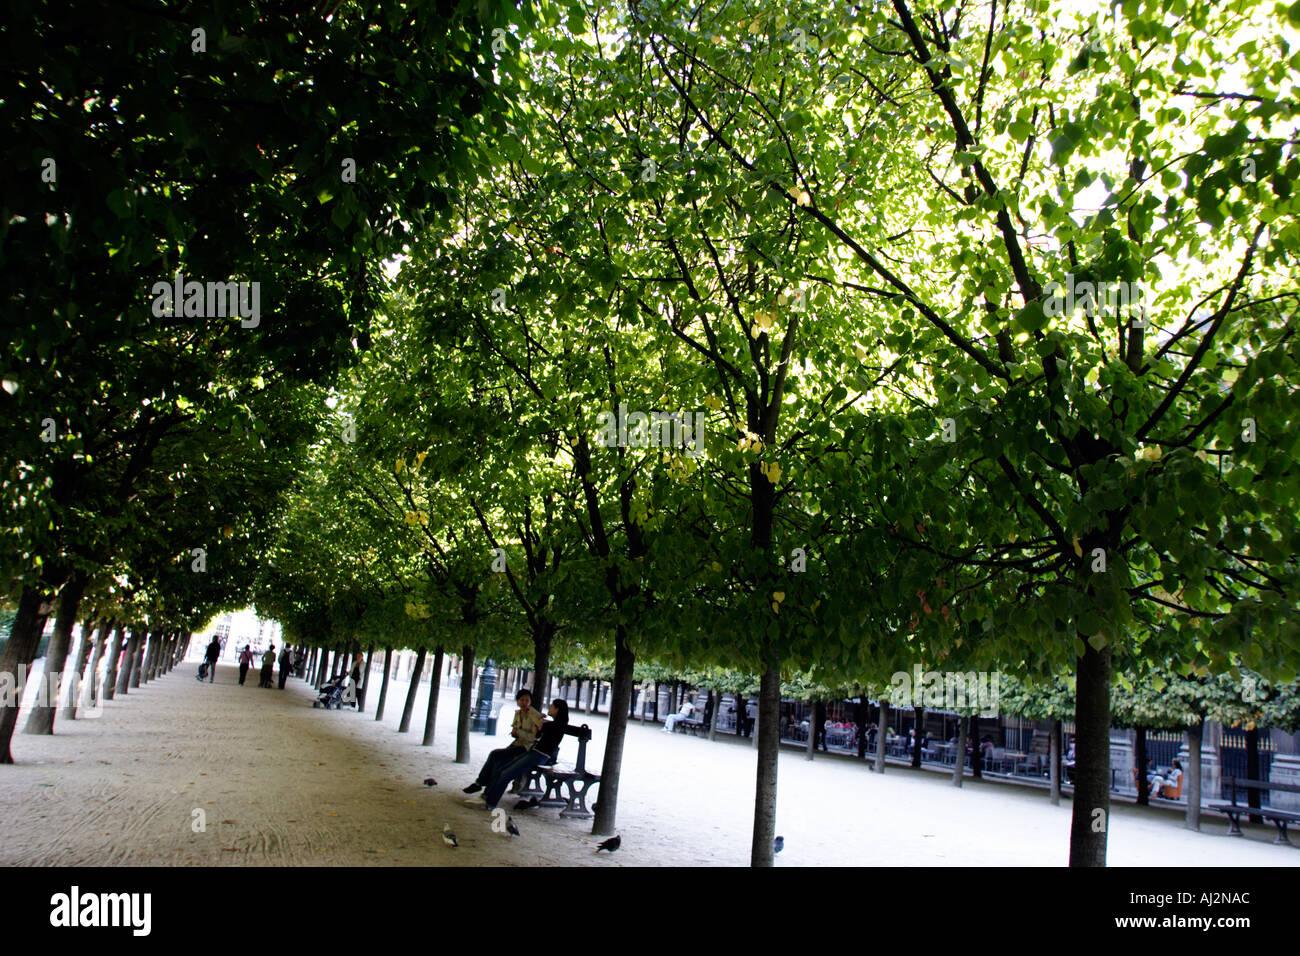 Paris France Jardin Du Palais Royale Royal Palace Garden Trees